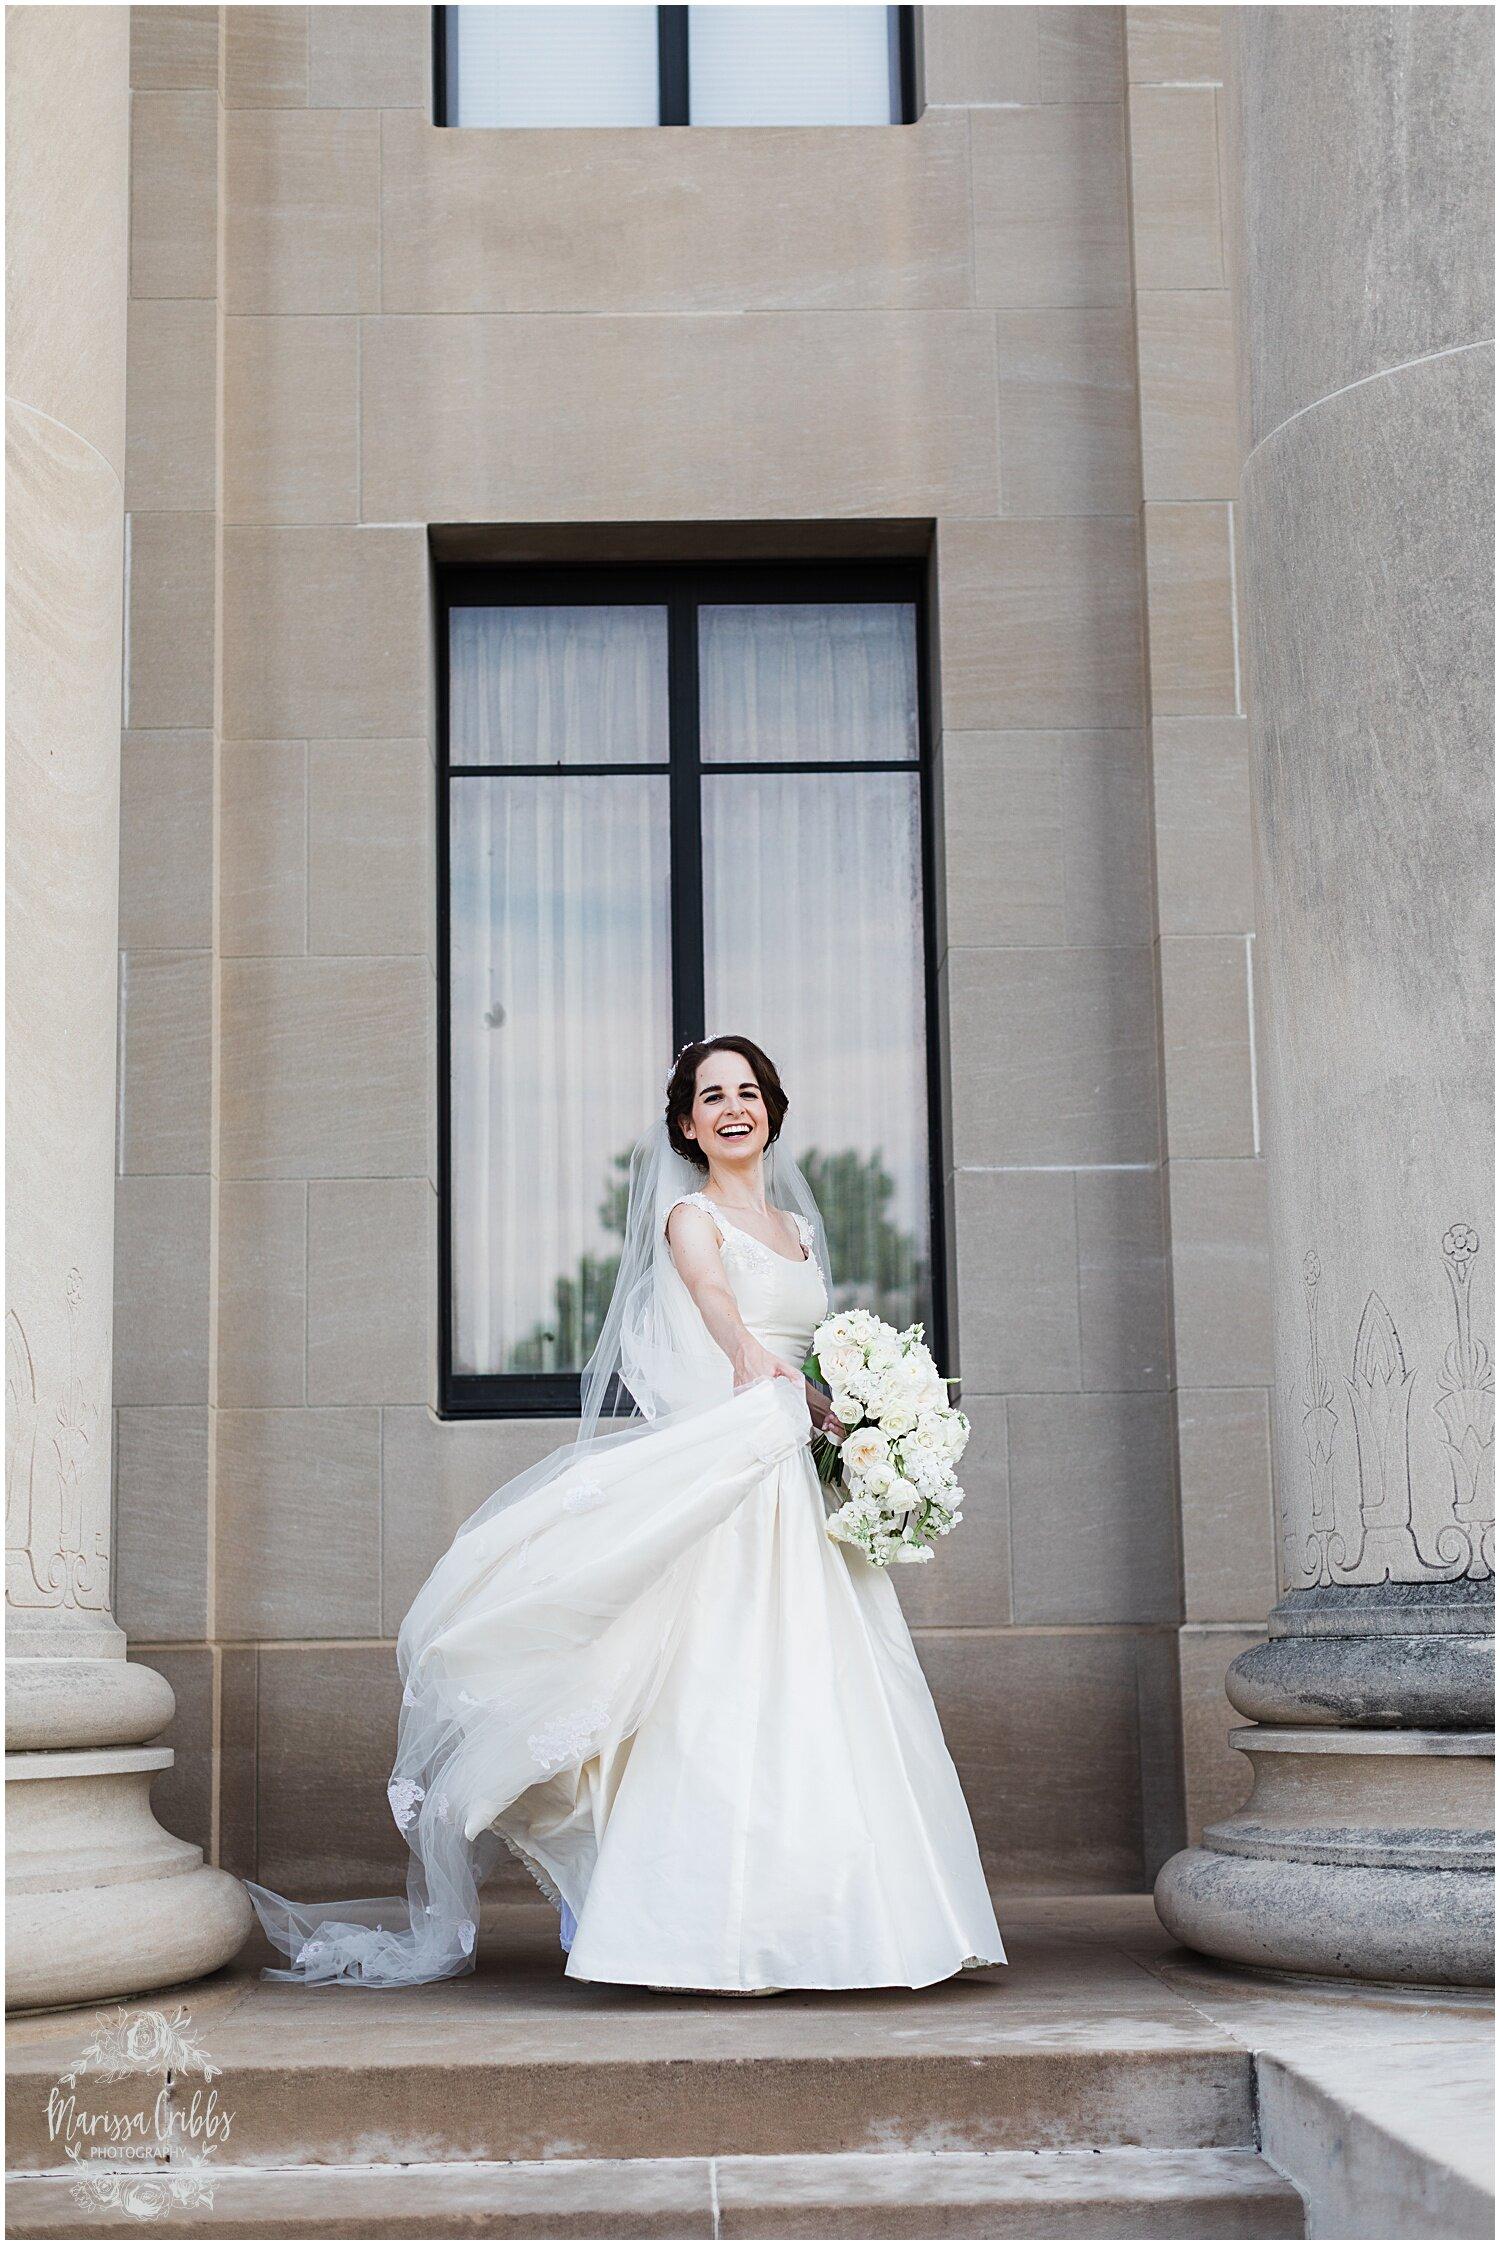 TYLER & CAROLINE MARRIED BLOG | MARISSA CRIBBS PHOTOGRAPHY | THE CARRIAGE CLUB | KANSAS CITY WEDDING PHOTOS_9249.jpg